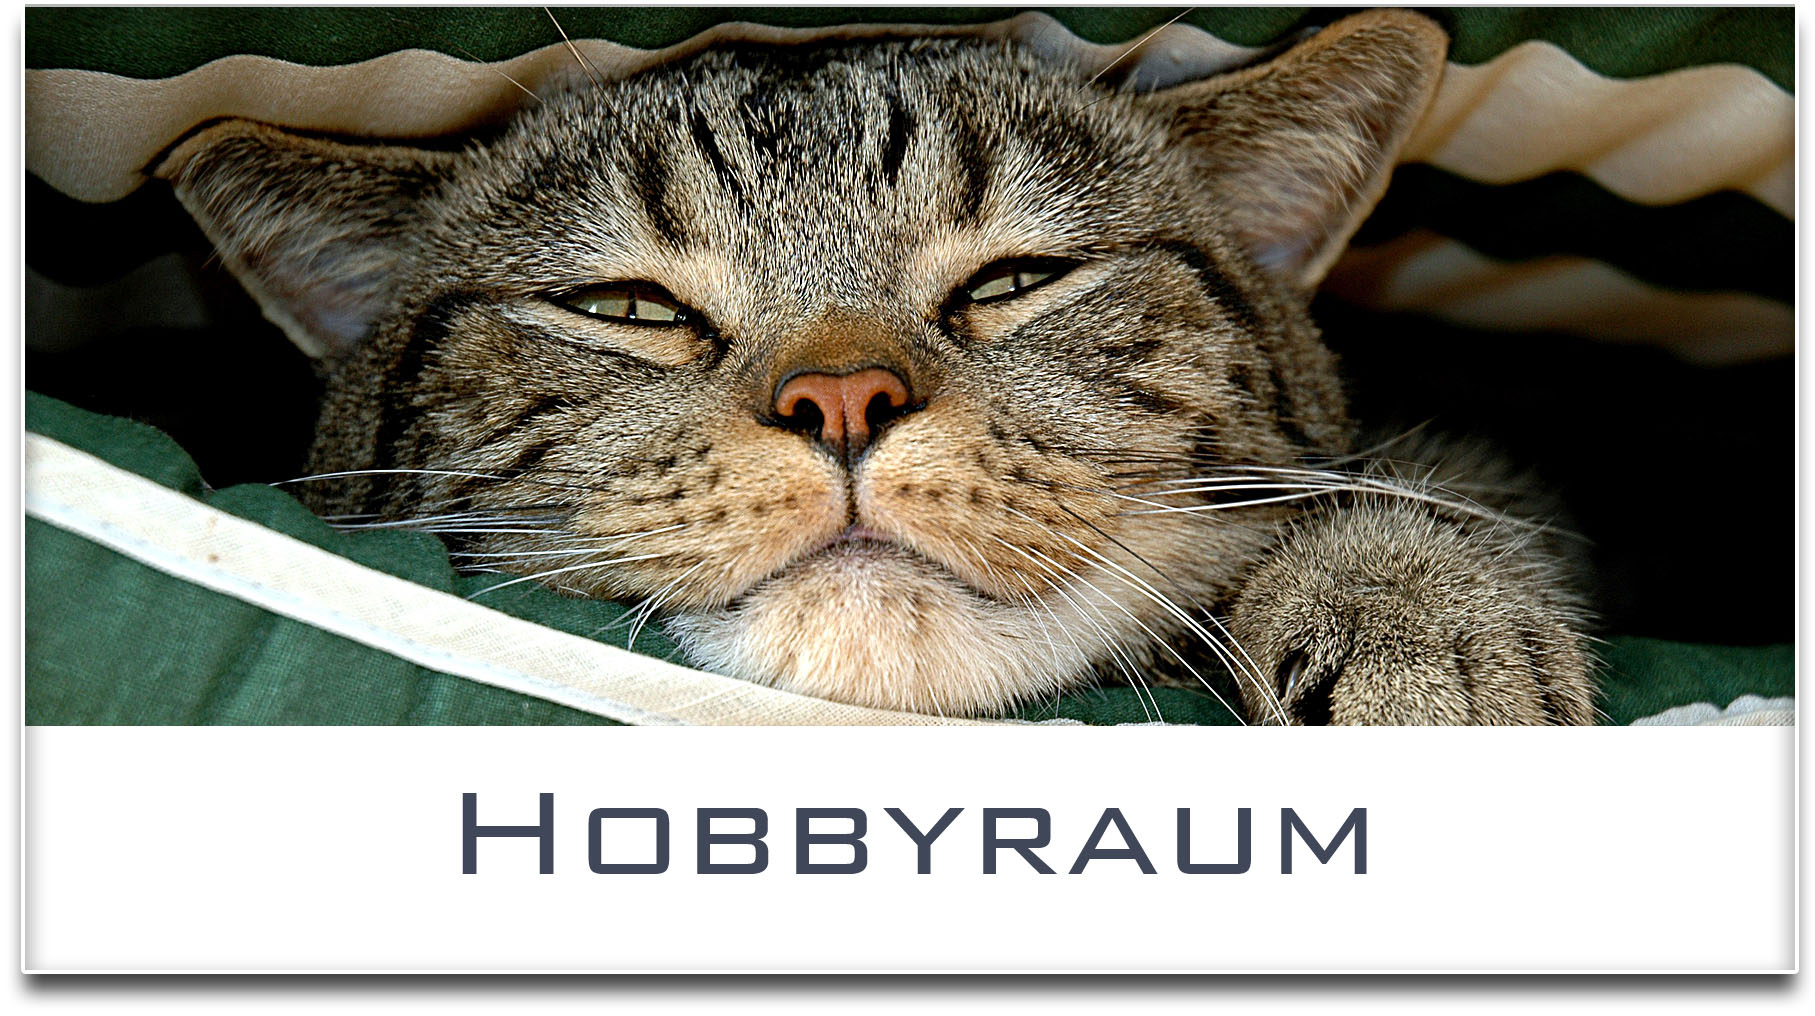 Türschild / Haustürschild / Katze / Hobbyraum / Selbstklebend